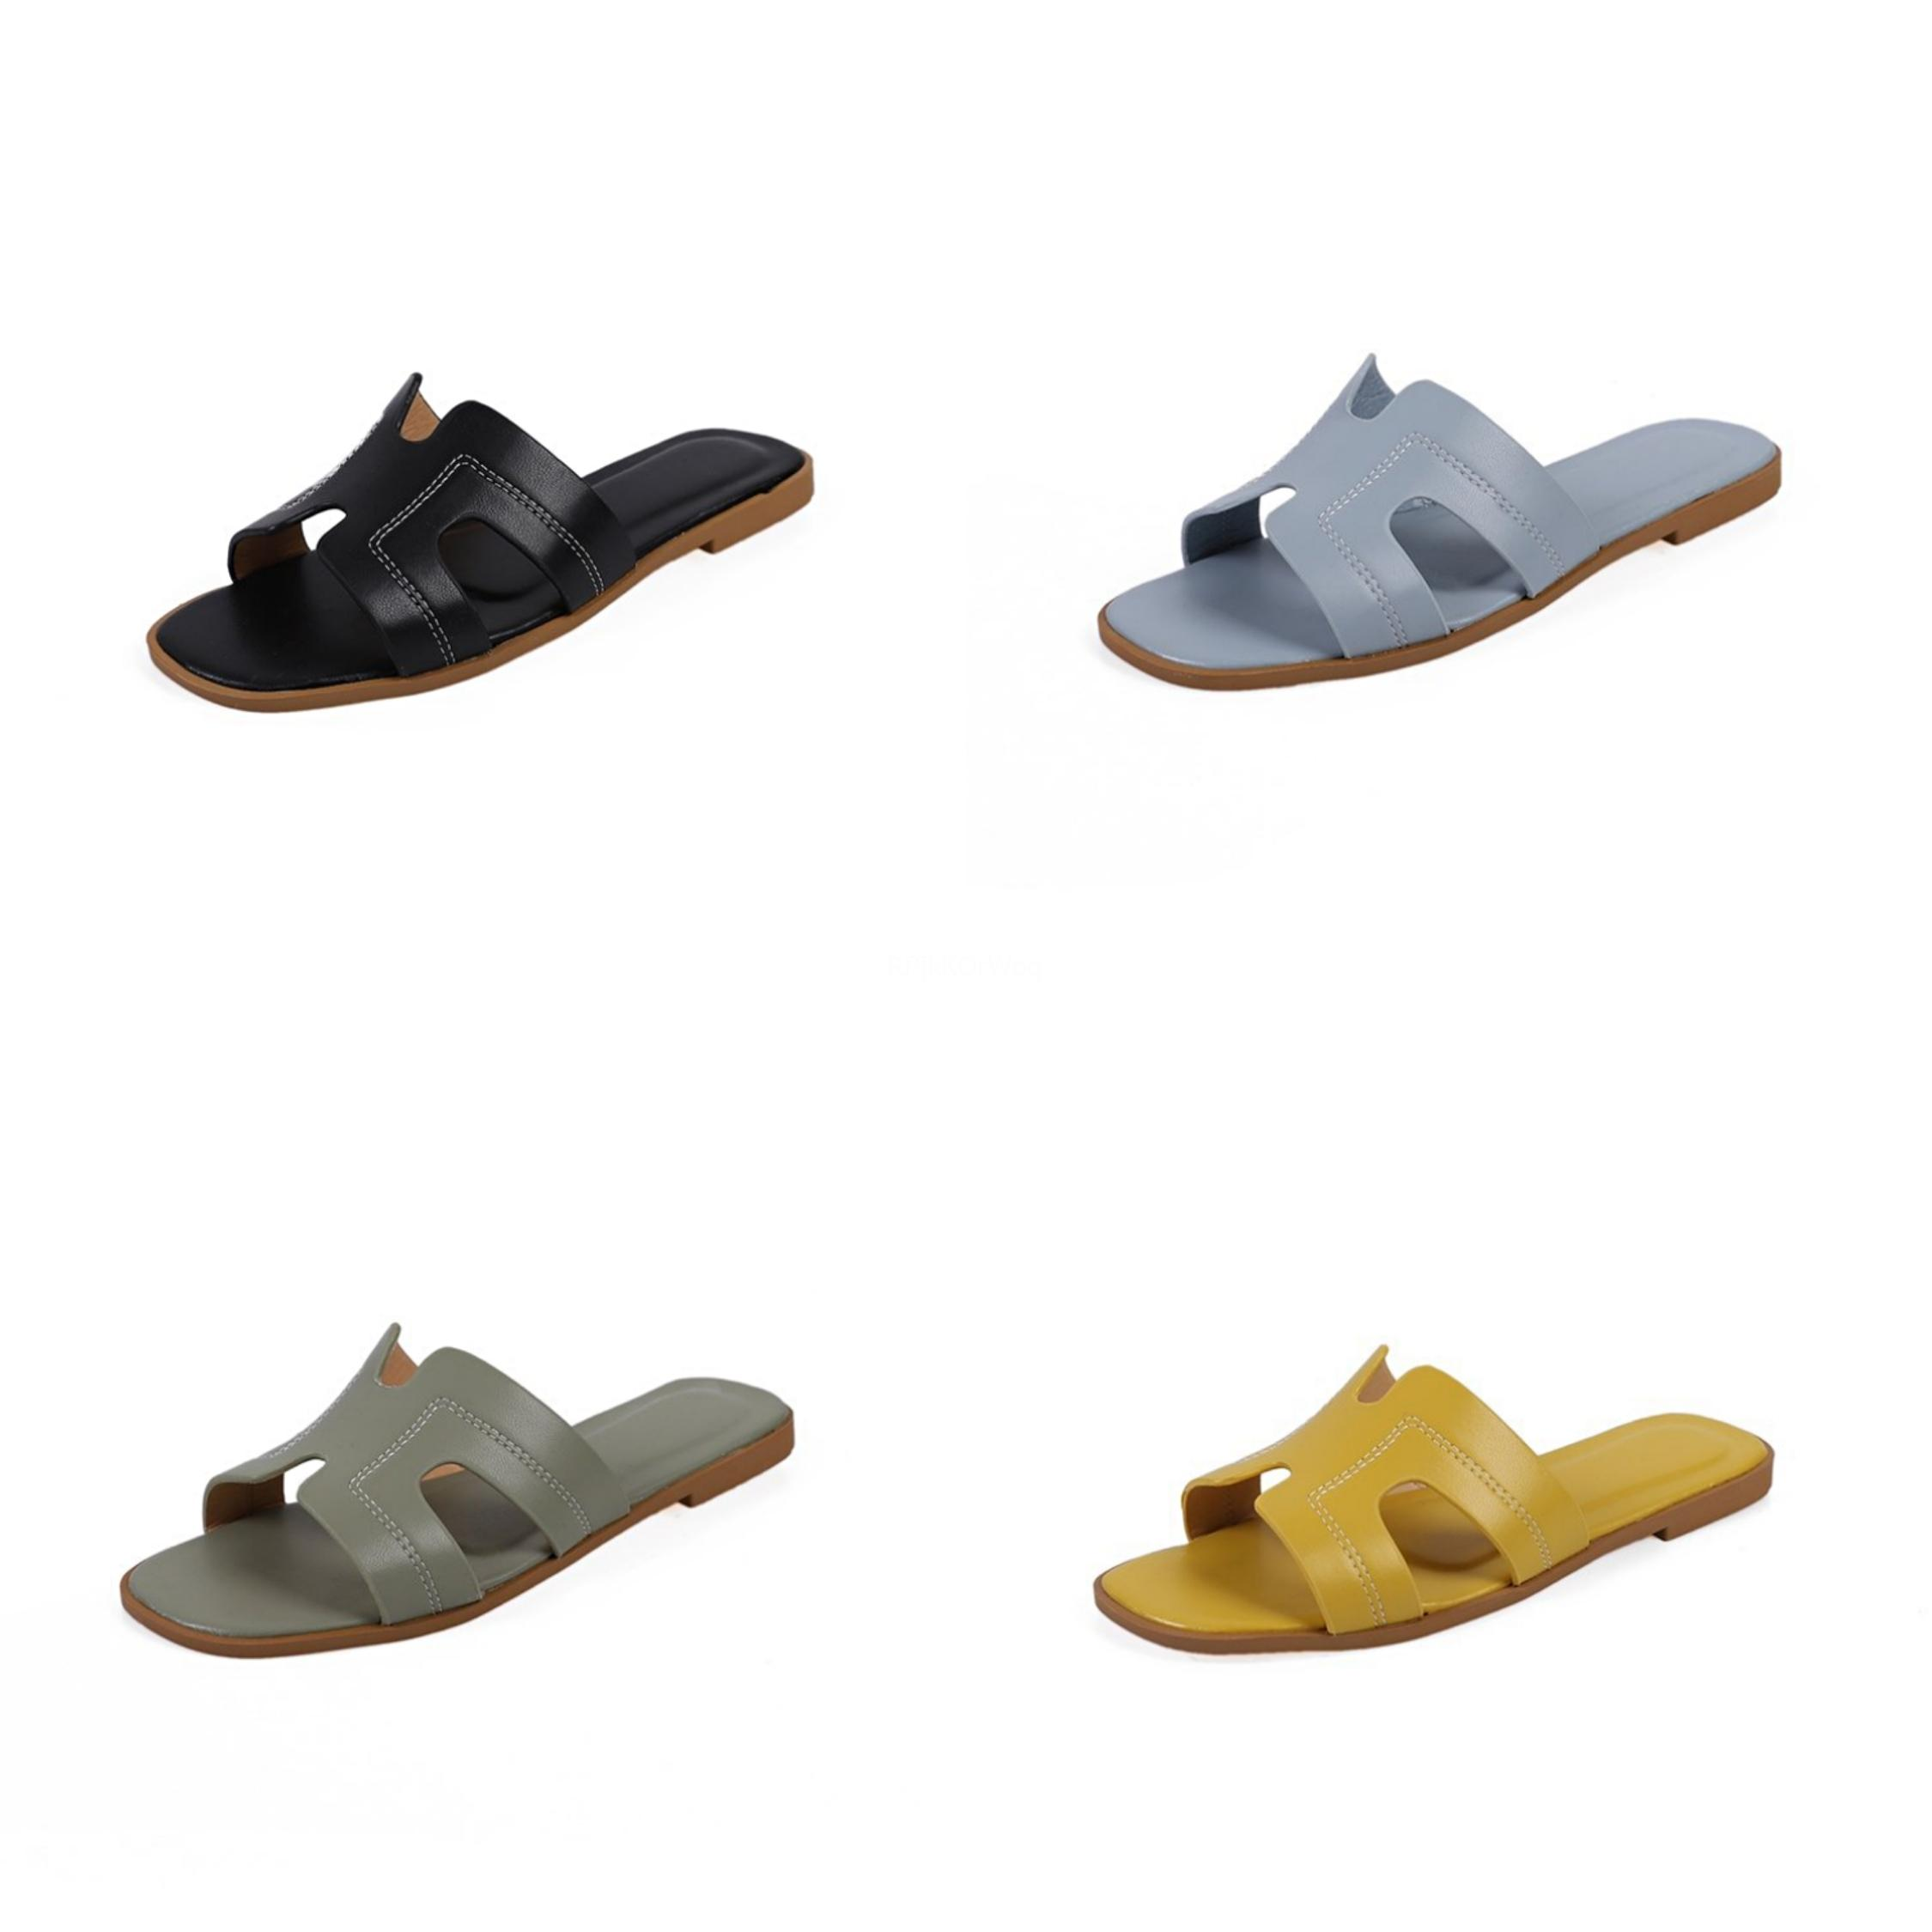 2020 Dilys Pvc Jelly pantofole Open Toe Tacchi alti Donne trasparente perspex pantofole scarpe tacco trasparente Pantofole Dimensione 35-42 # 827